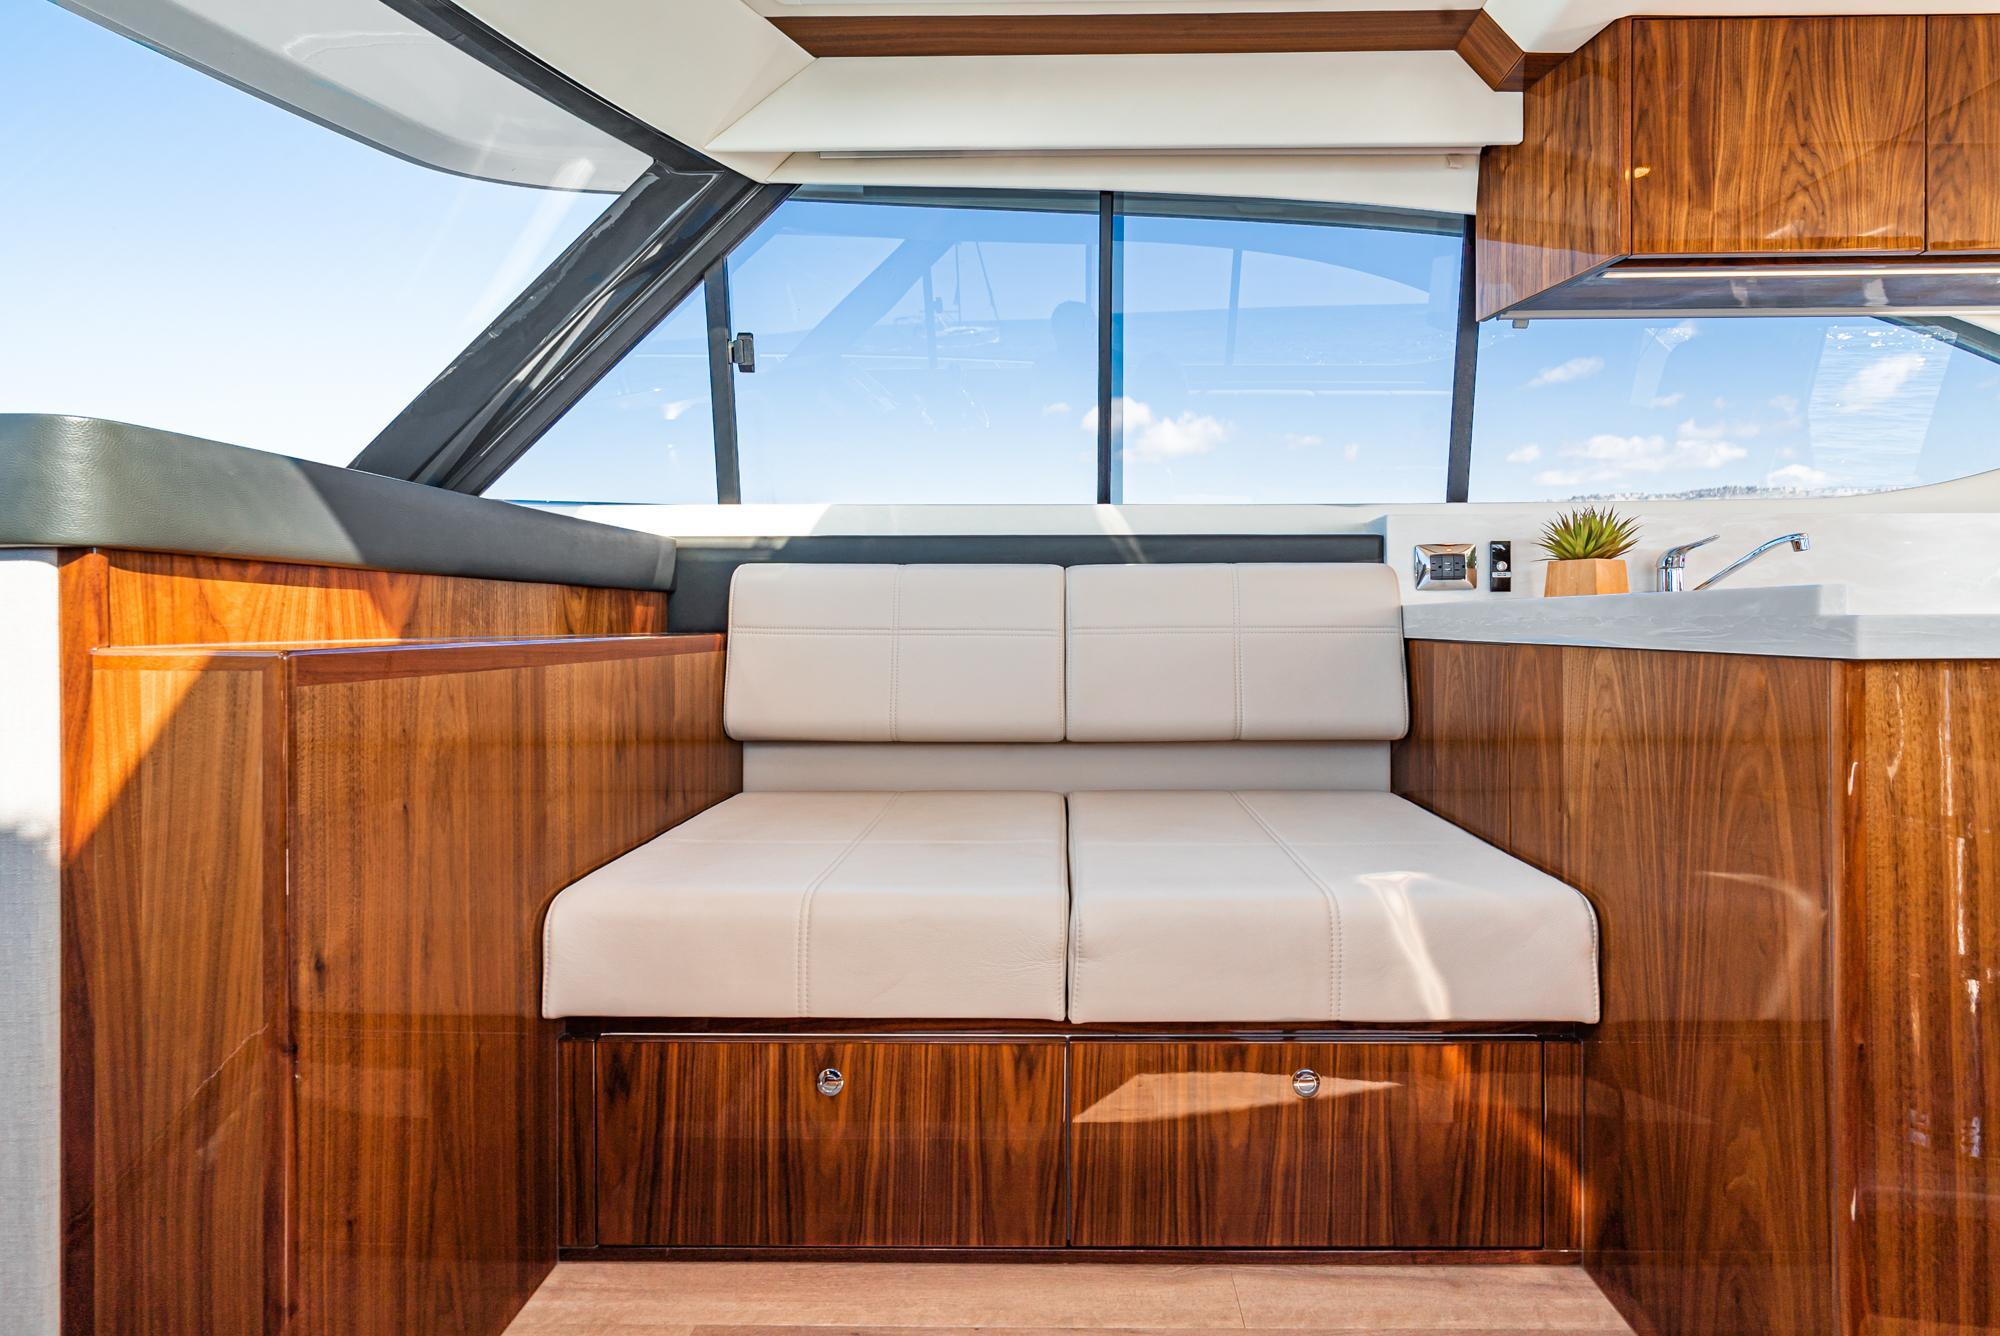 2020 Riviera 395 SUV #TB032BB inventory image at Sun Country Coastal in Newport Beach